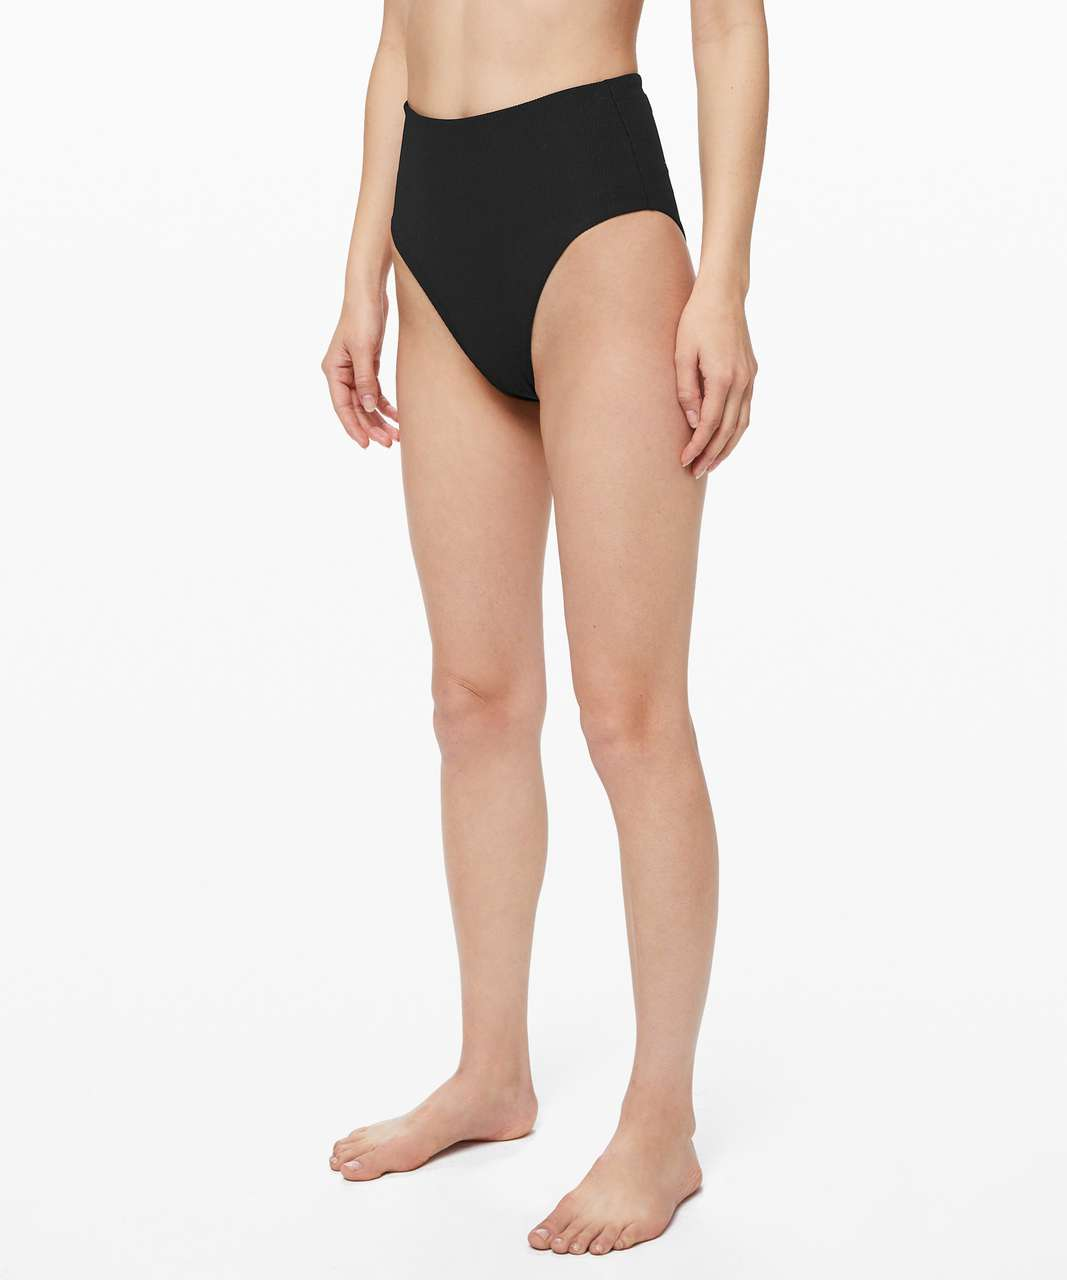 Lululemon Clear Waters High-Rise Skimpy Bottom - Black